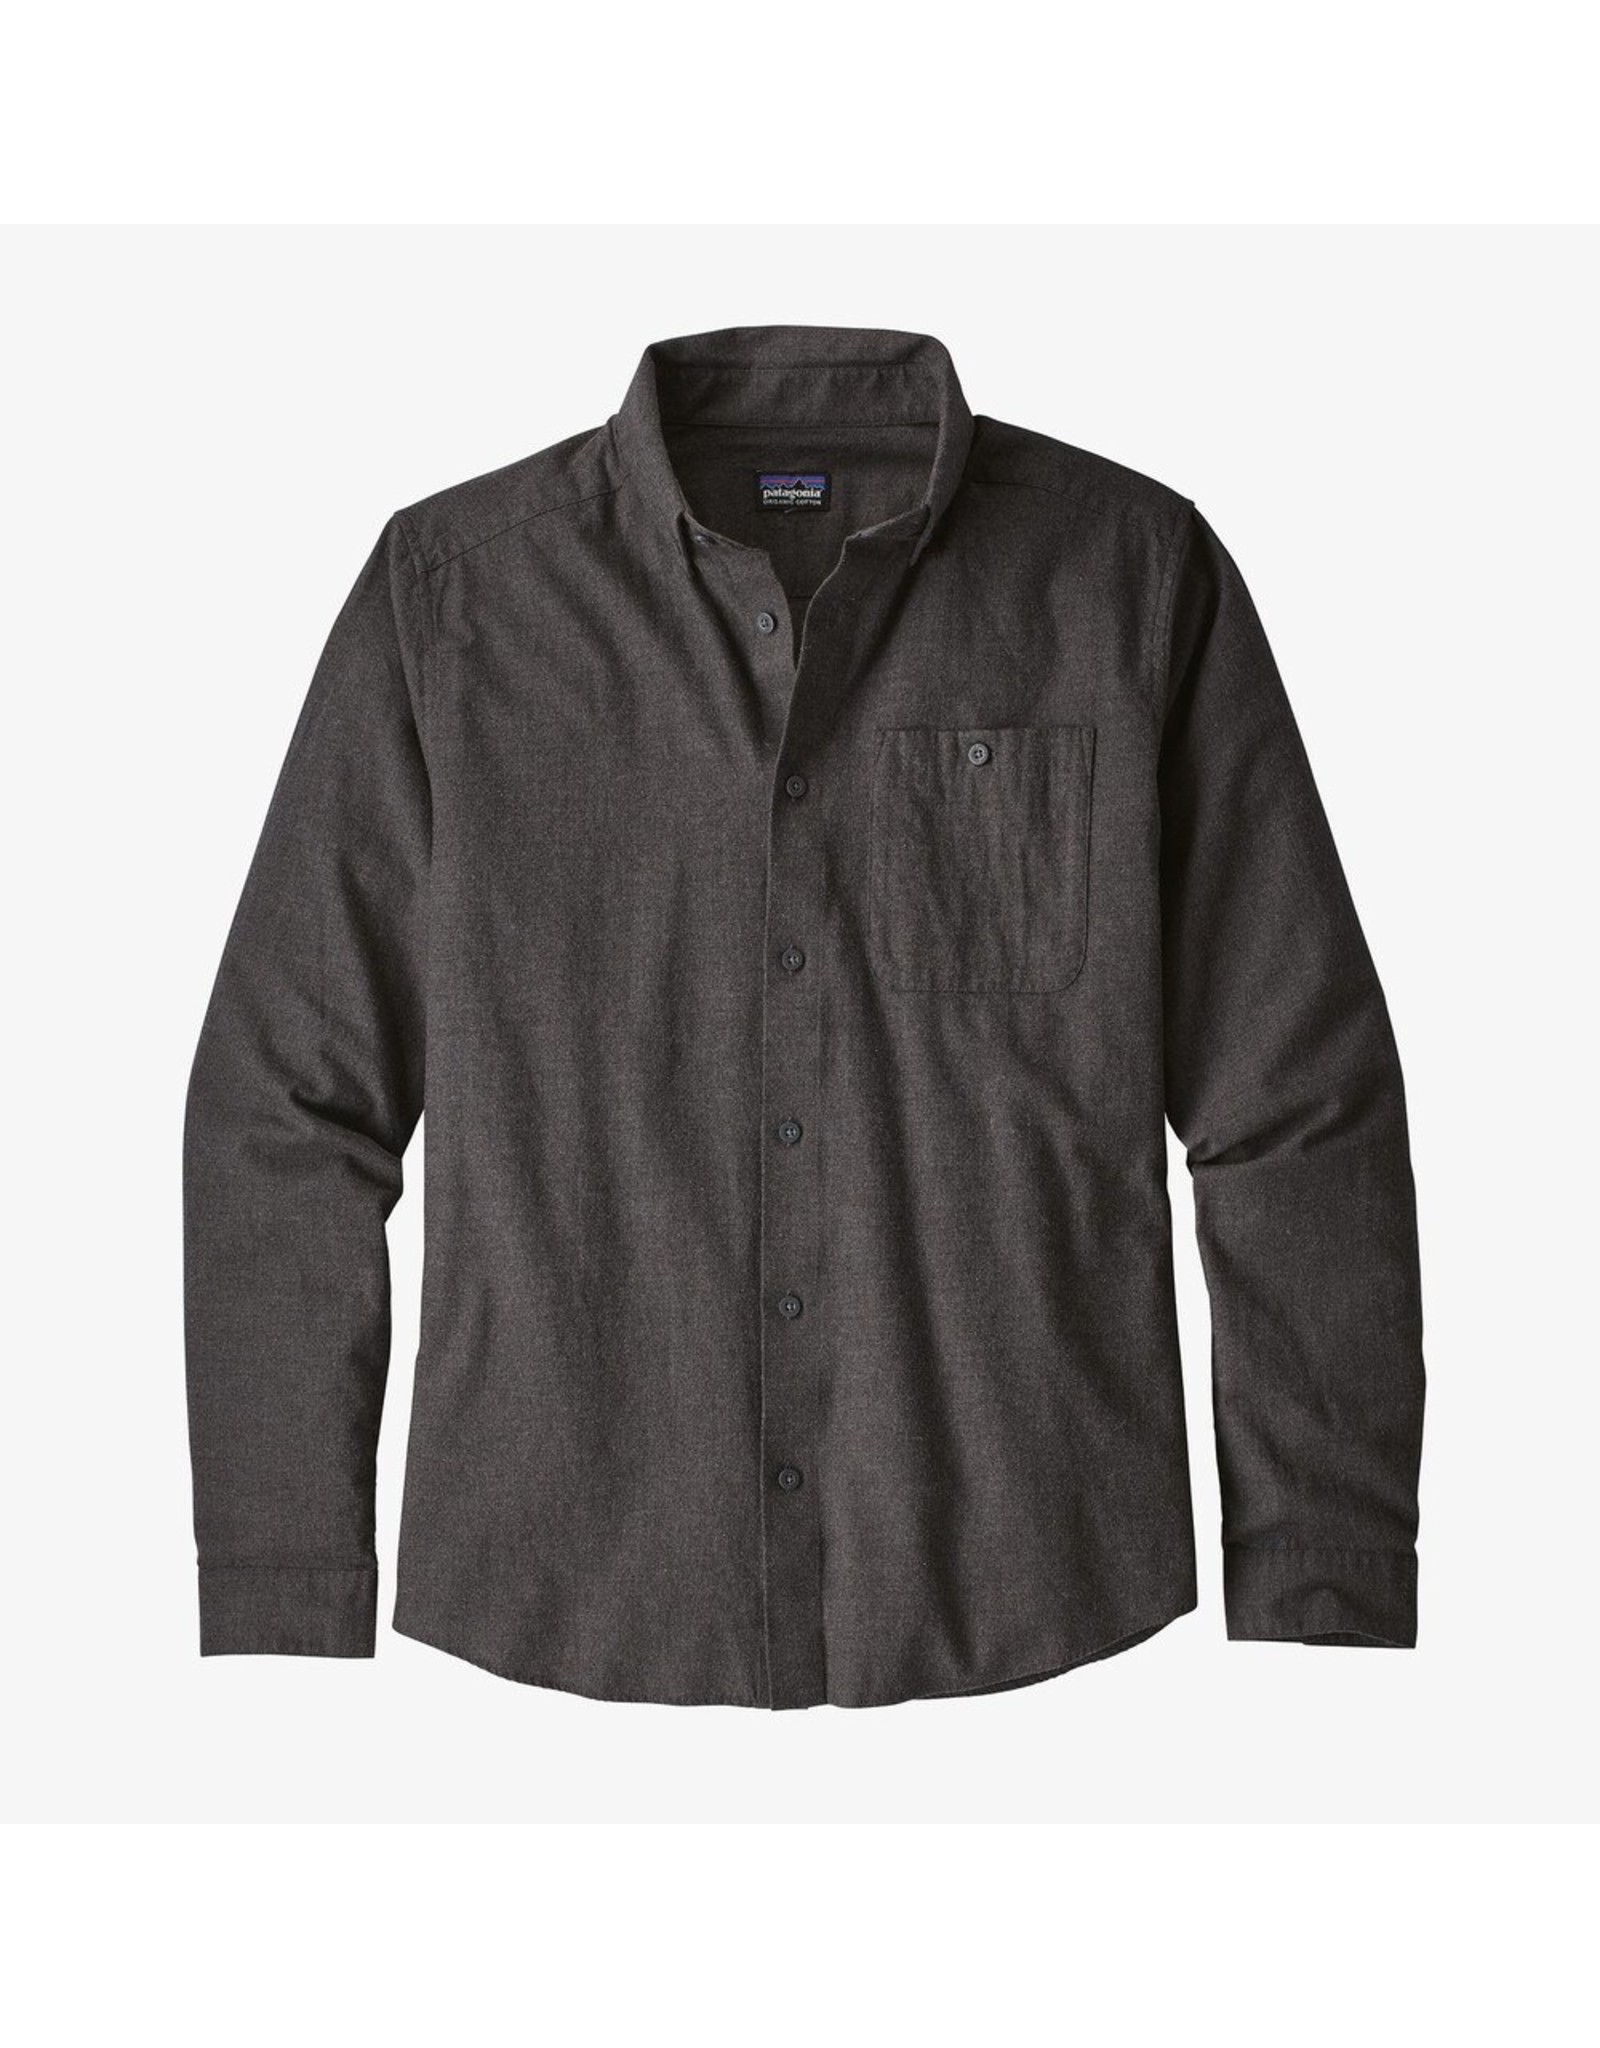 Patagonia Patagonia - M's L/S Vjosa River Pima Cotton Shirt